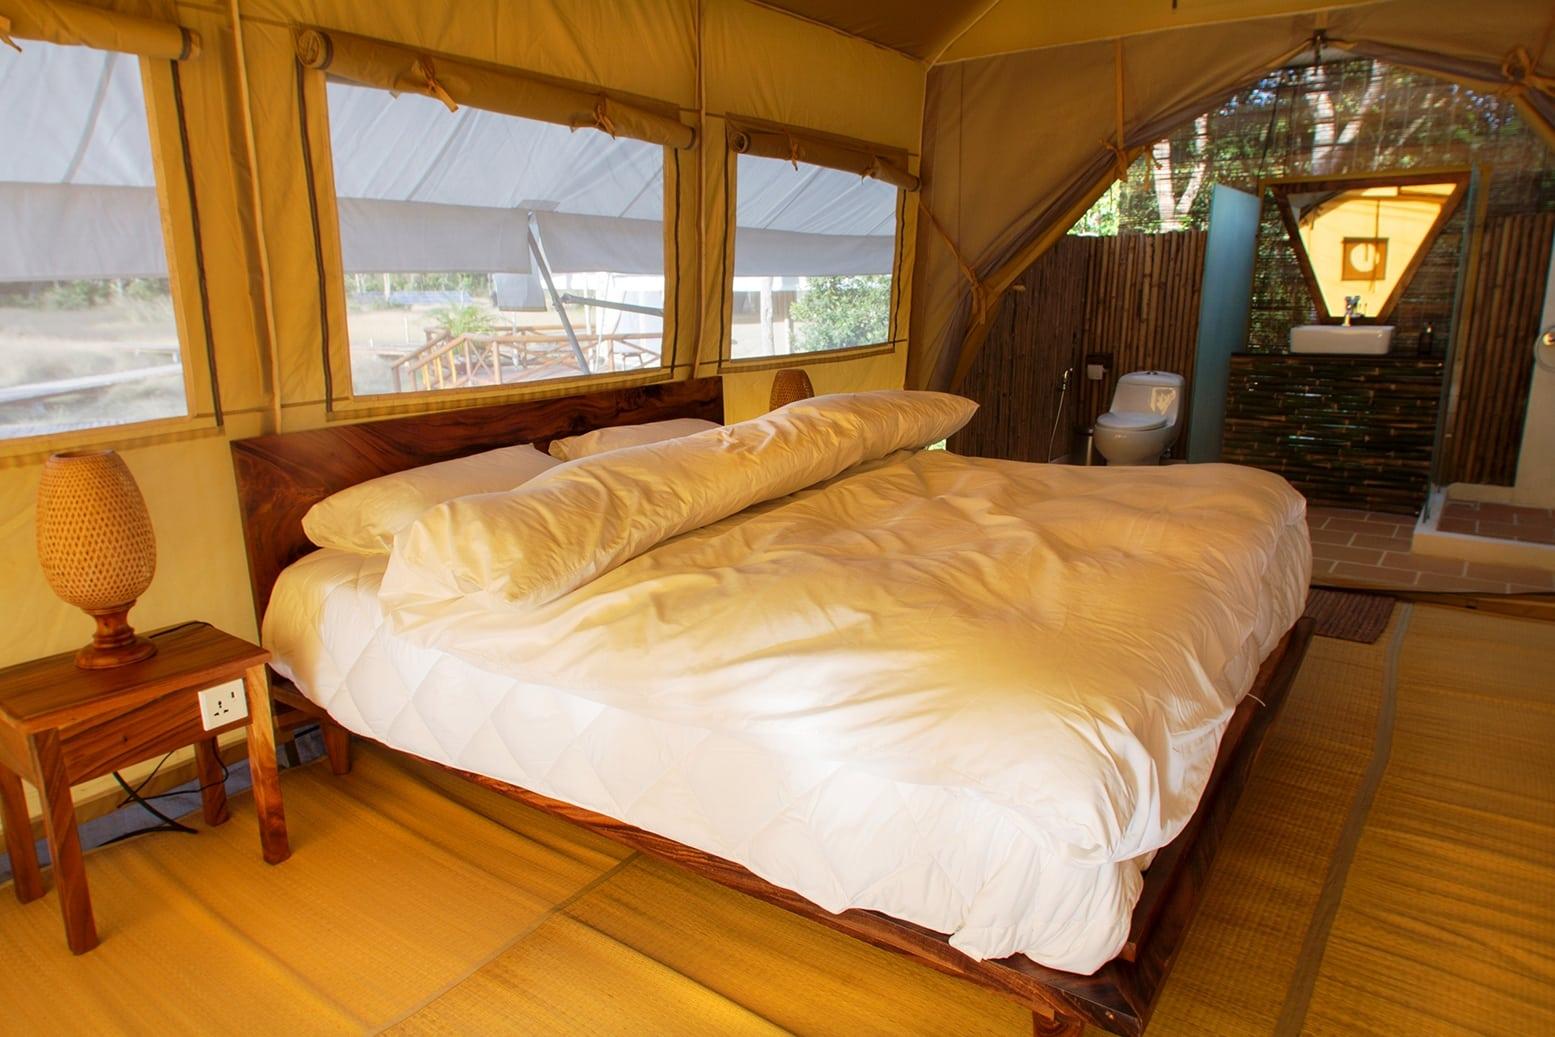 cardamom tented camp Cardamom Tented Camp cardamom tented camp Bedroom